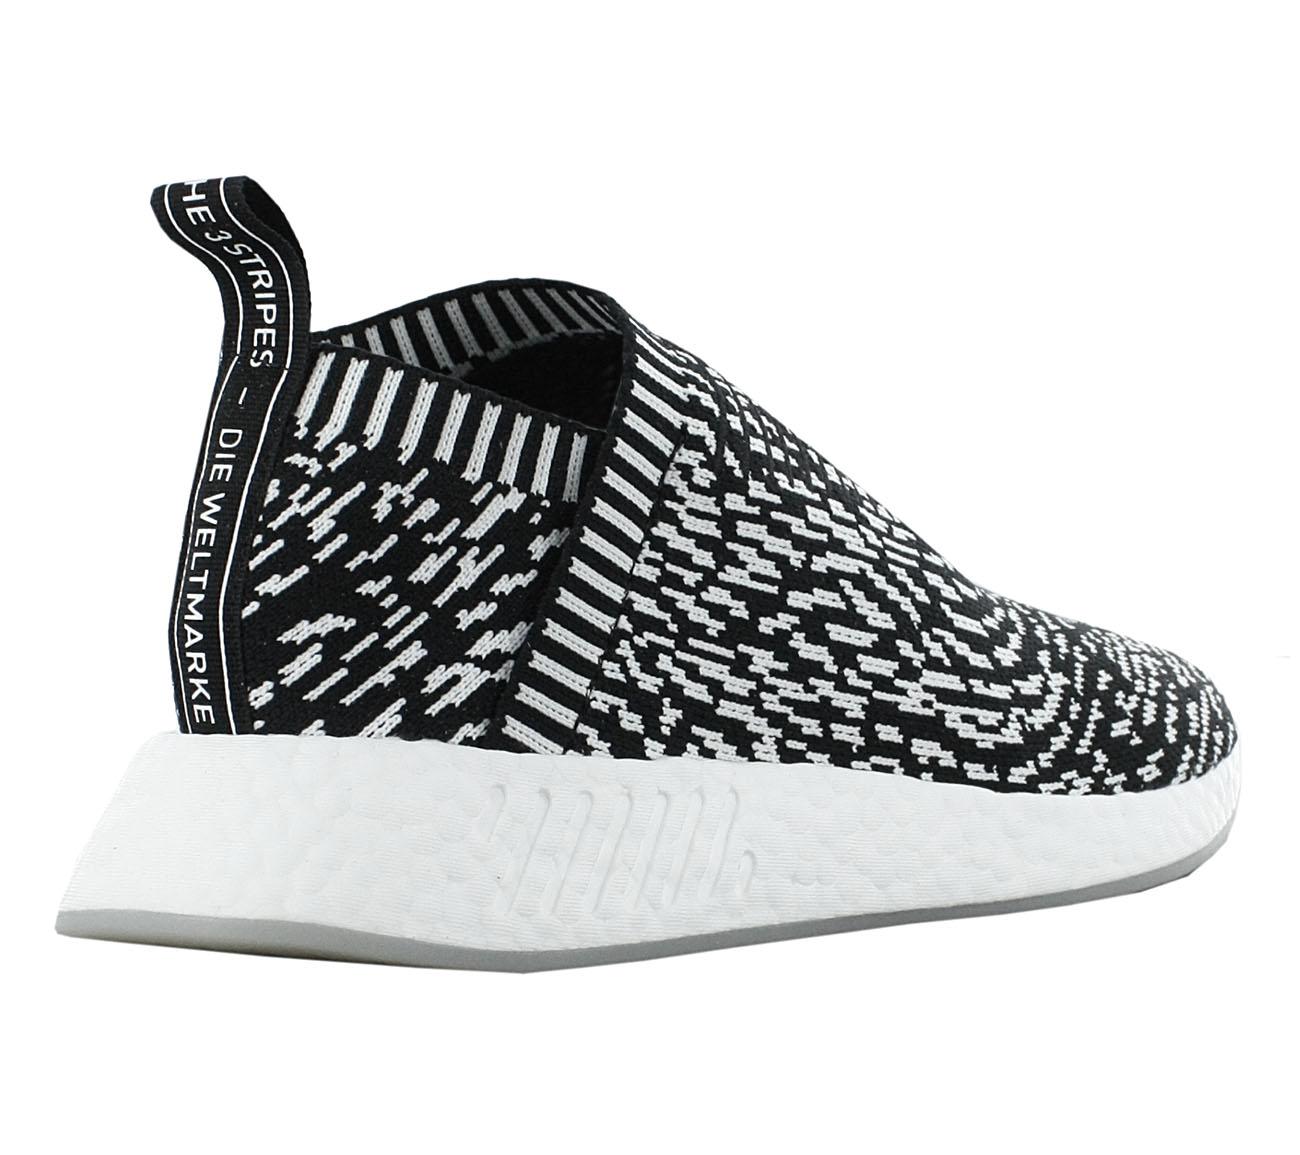 Details about Adidas Originals NMD ts1 cs1 GTX cs2 r1 r2 Racer Sneaker Mens Shoes show original title